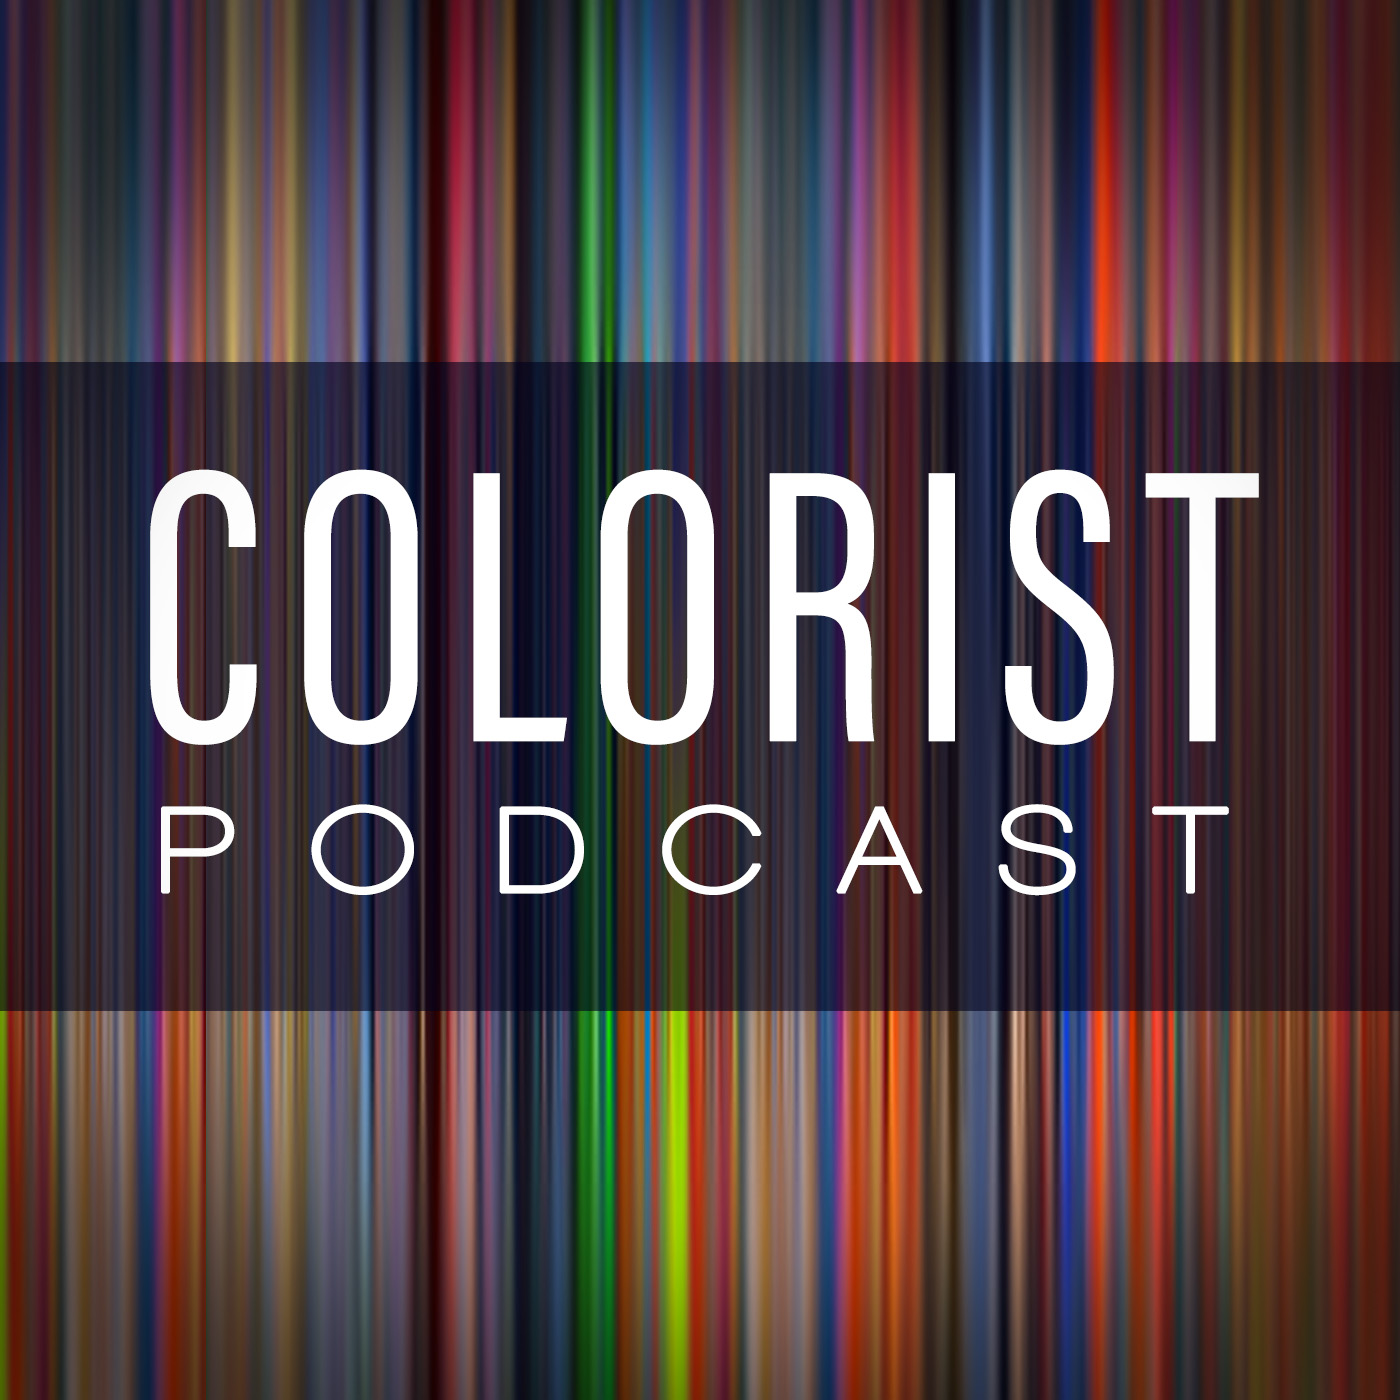 Colorist Podcast show art